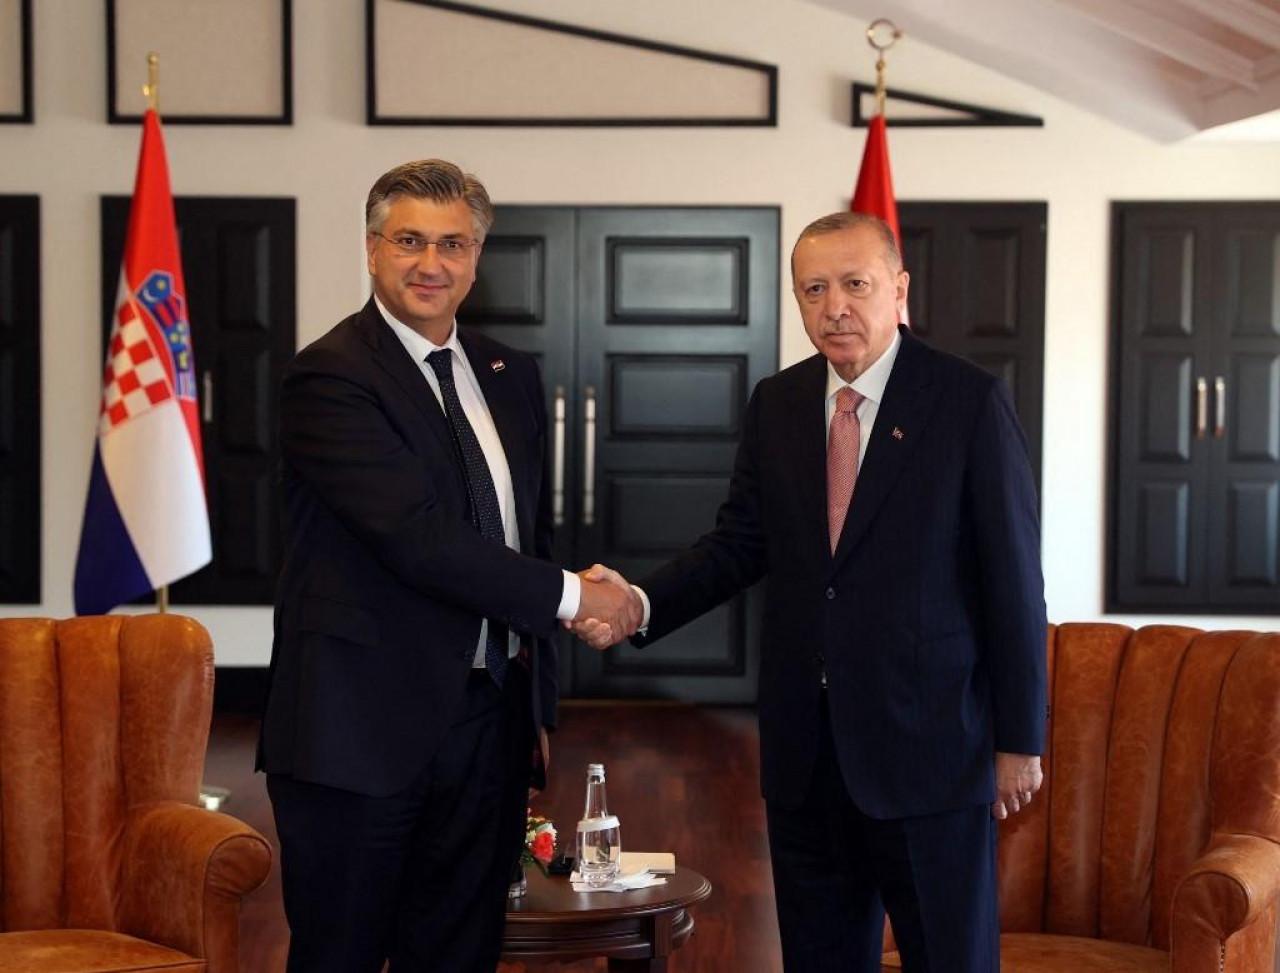 Rusko-Turski summit u Sočiju: Na stolu Sirija, Libija, Afganistan, Kavkaz i Balkan O_11441561_1280